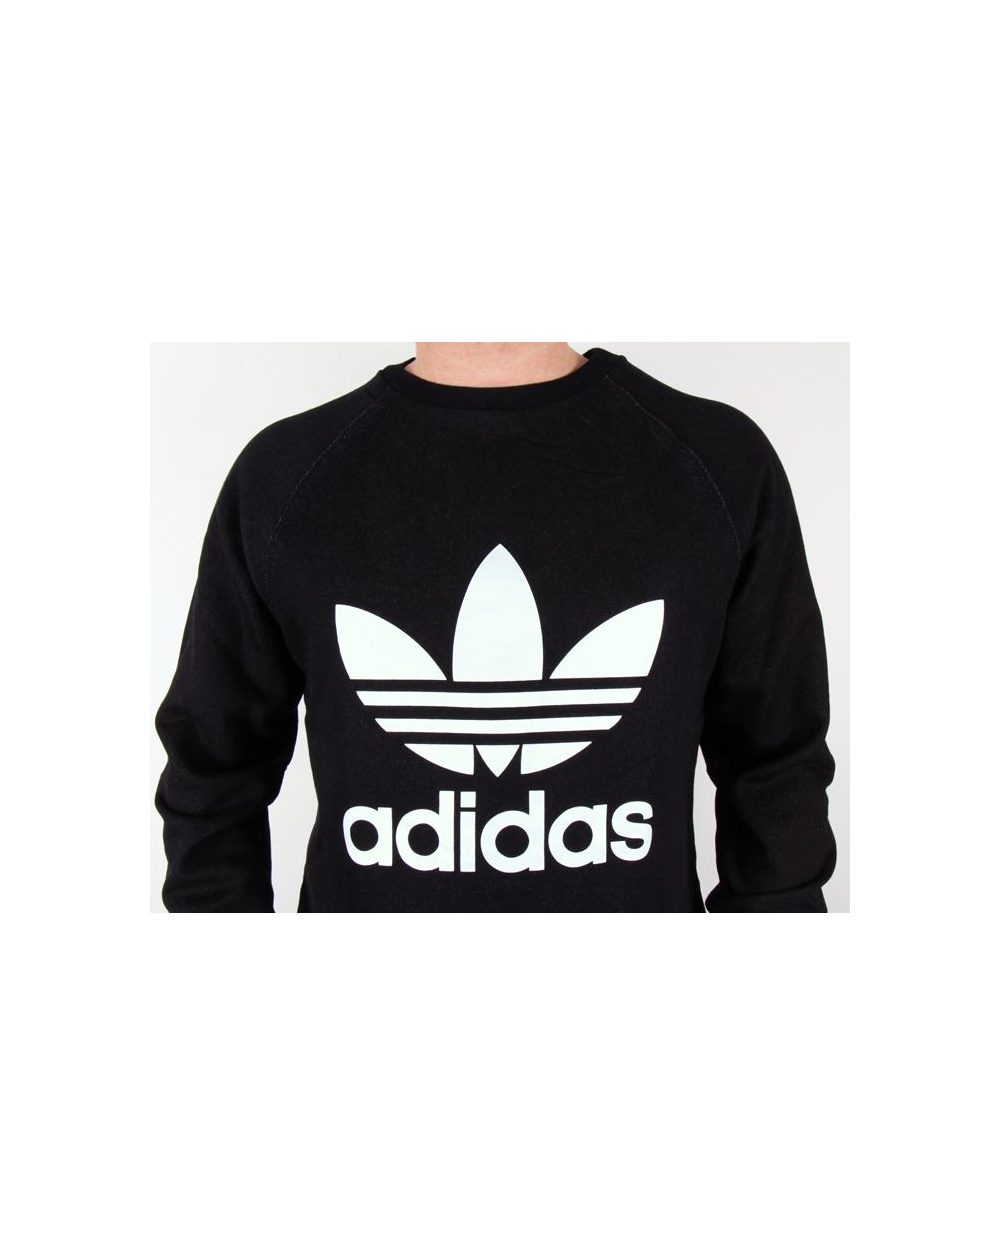 Adidas Sweatshirt Black And White